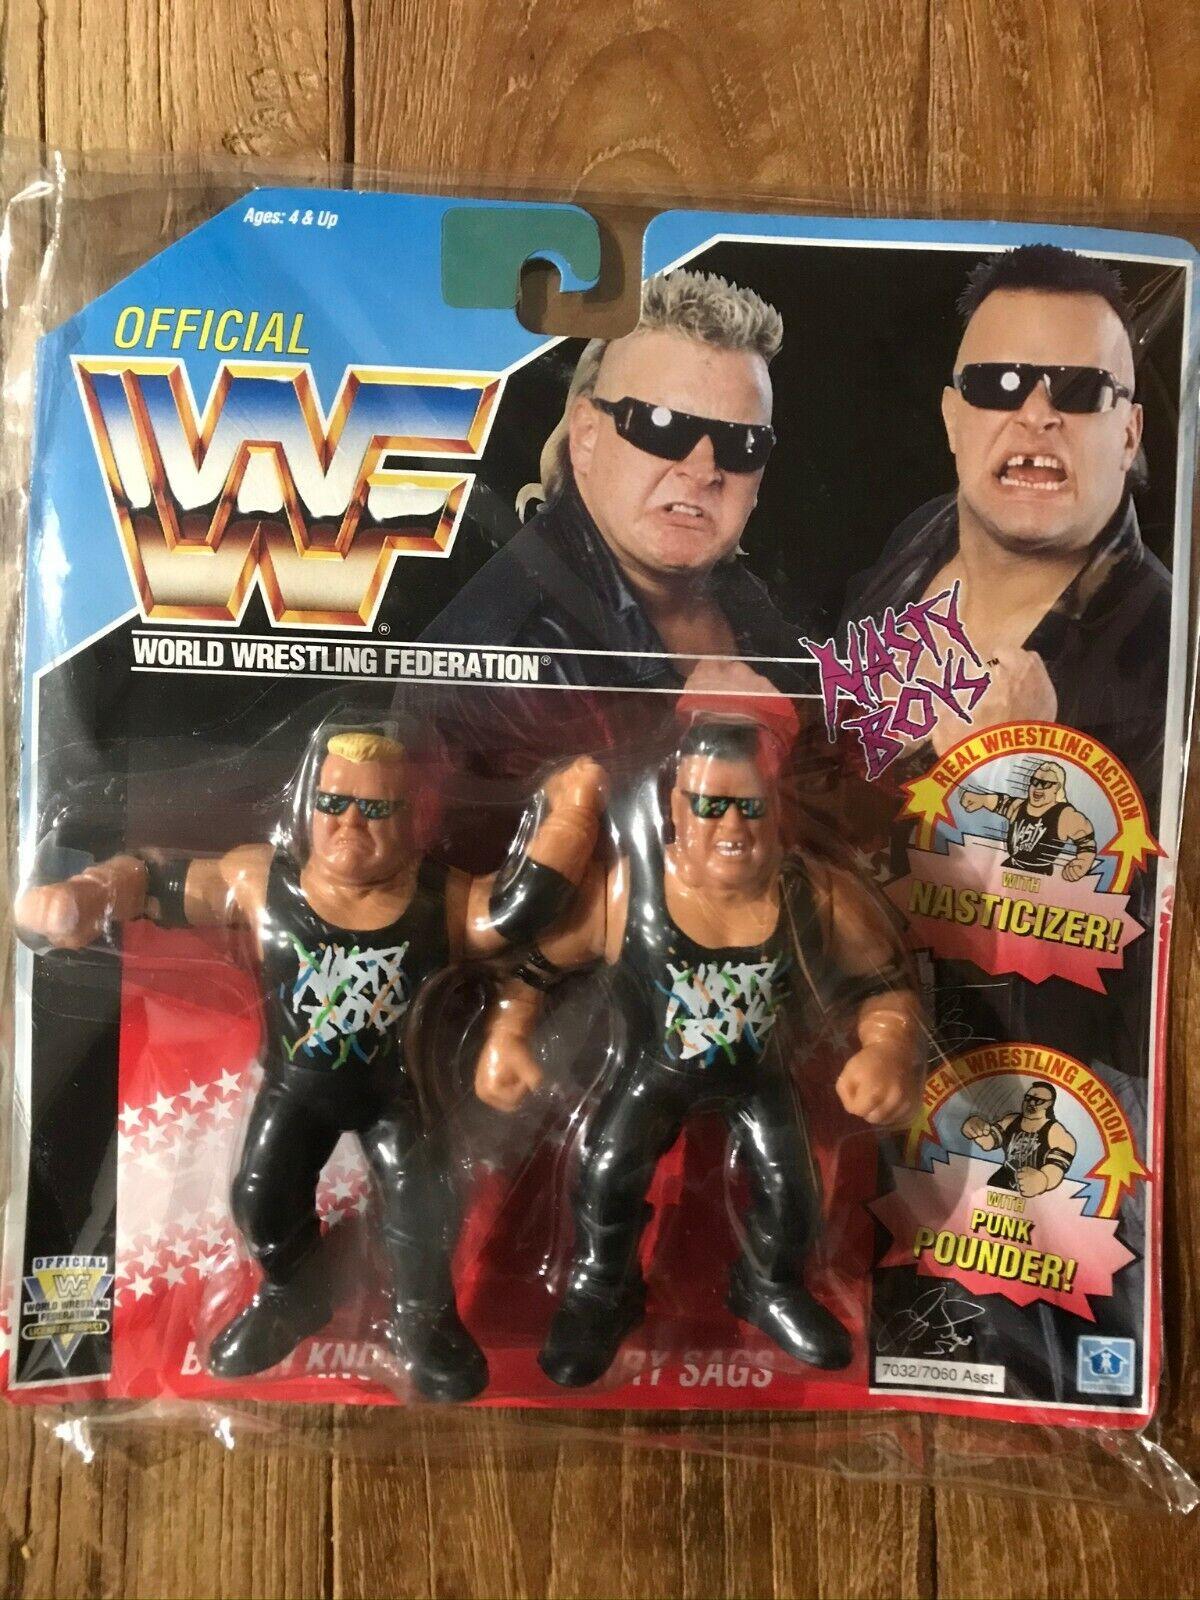 NASTY BOYS Nobbs and Saggs tag team Hasbro Figure WWF WWE 1992 Blau card Vintage